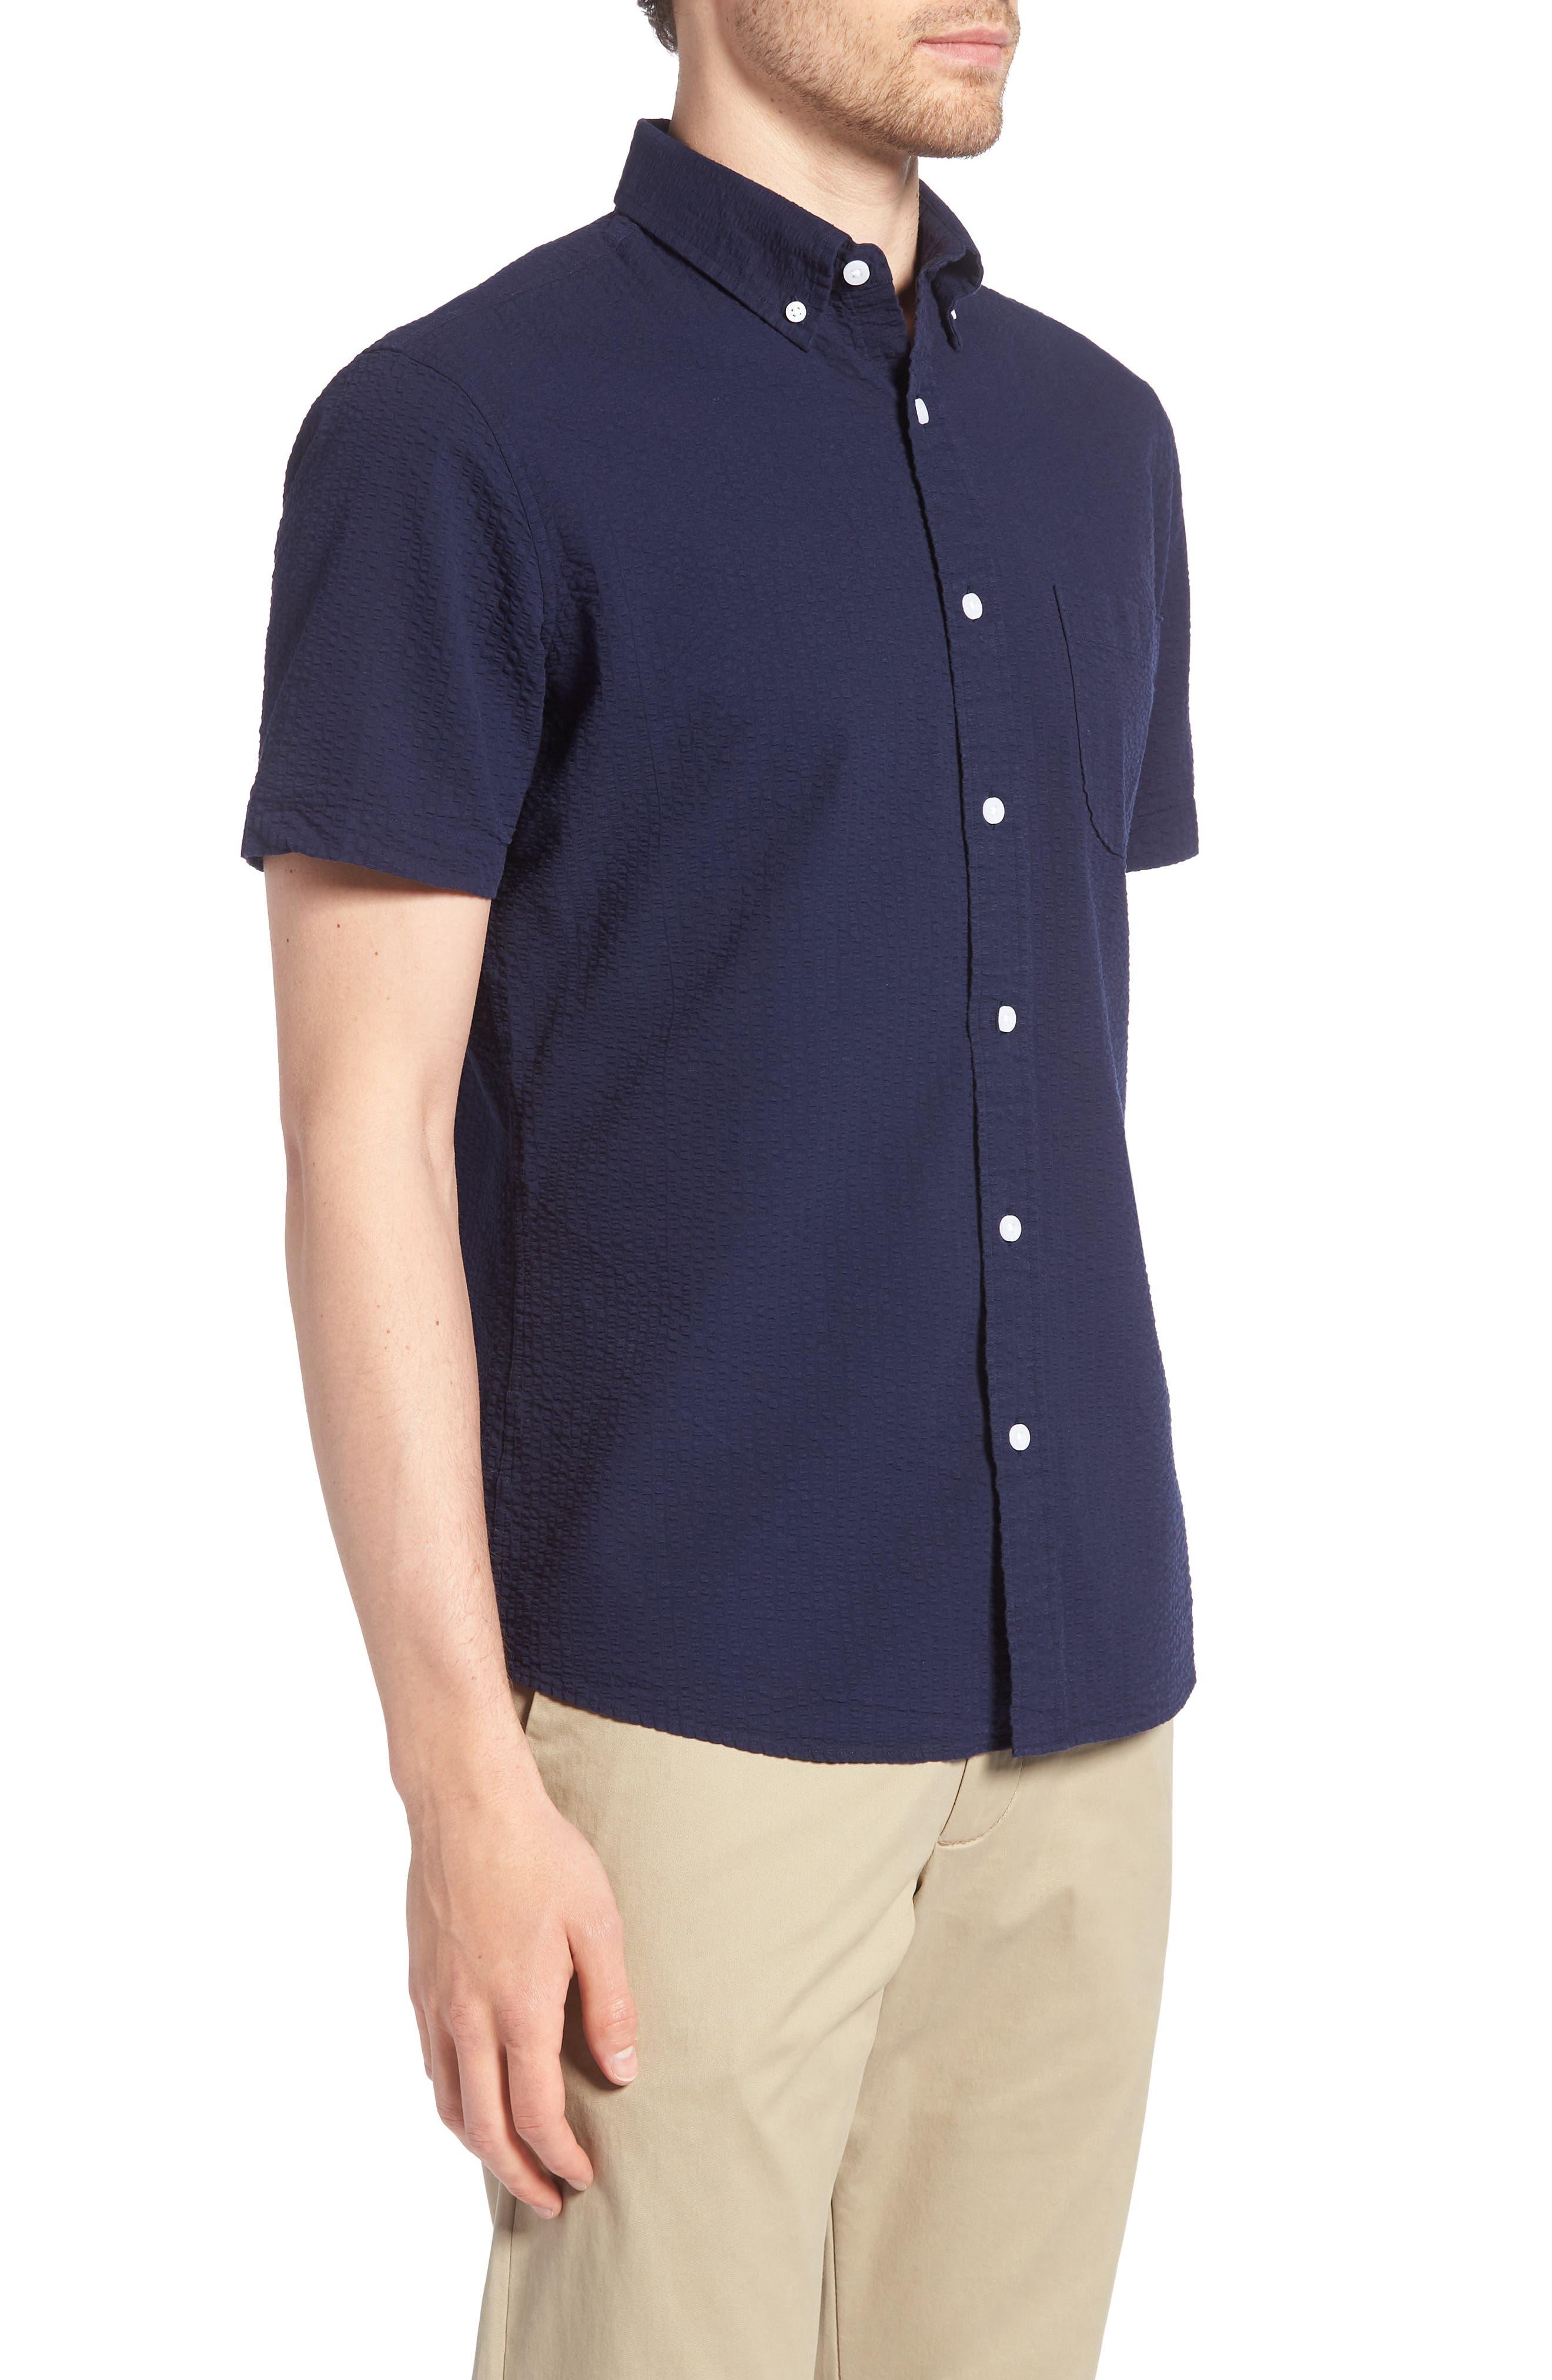 Trim Fit Seersucker Sport Shirt,                             Alternate thumbnail 4, color,                             Navy Iris Seersucker